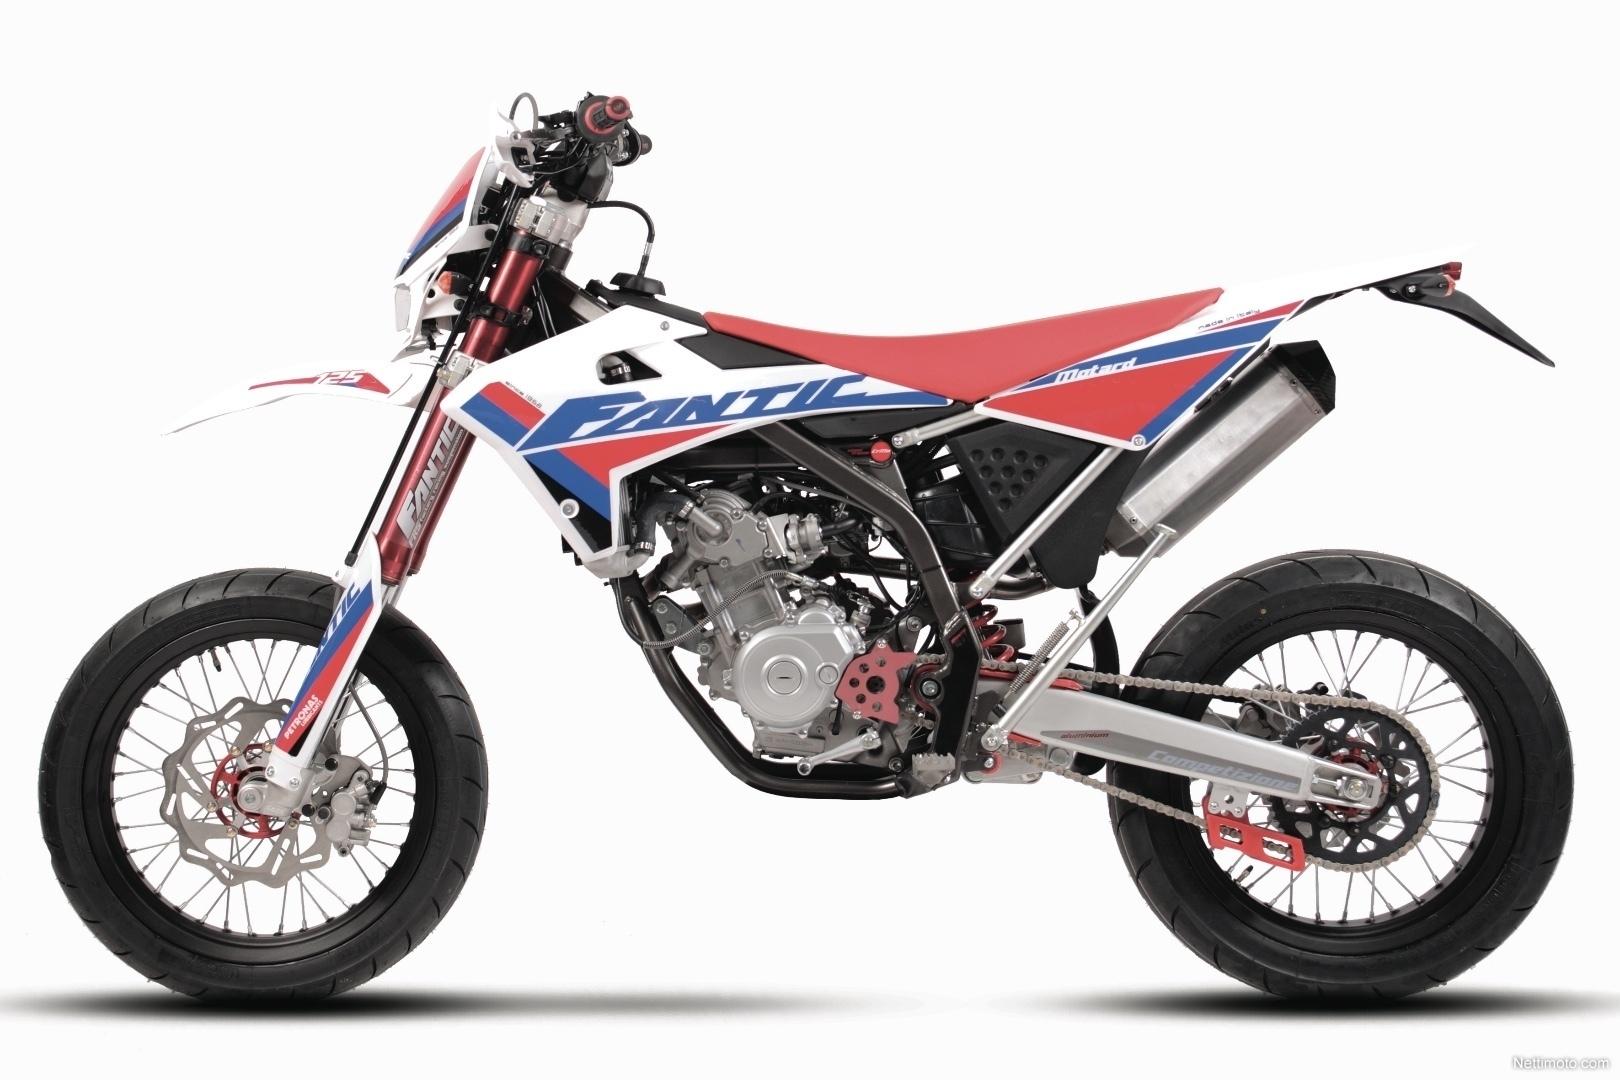 fantic motor caballero 125 competizione 125 motard 125 cm 2017 espoo motorcycle nettimoto. Black Bedroom Furniture Sets. Home Design Ideas